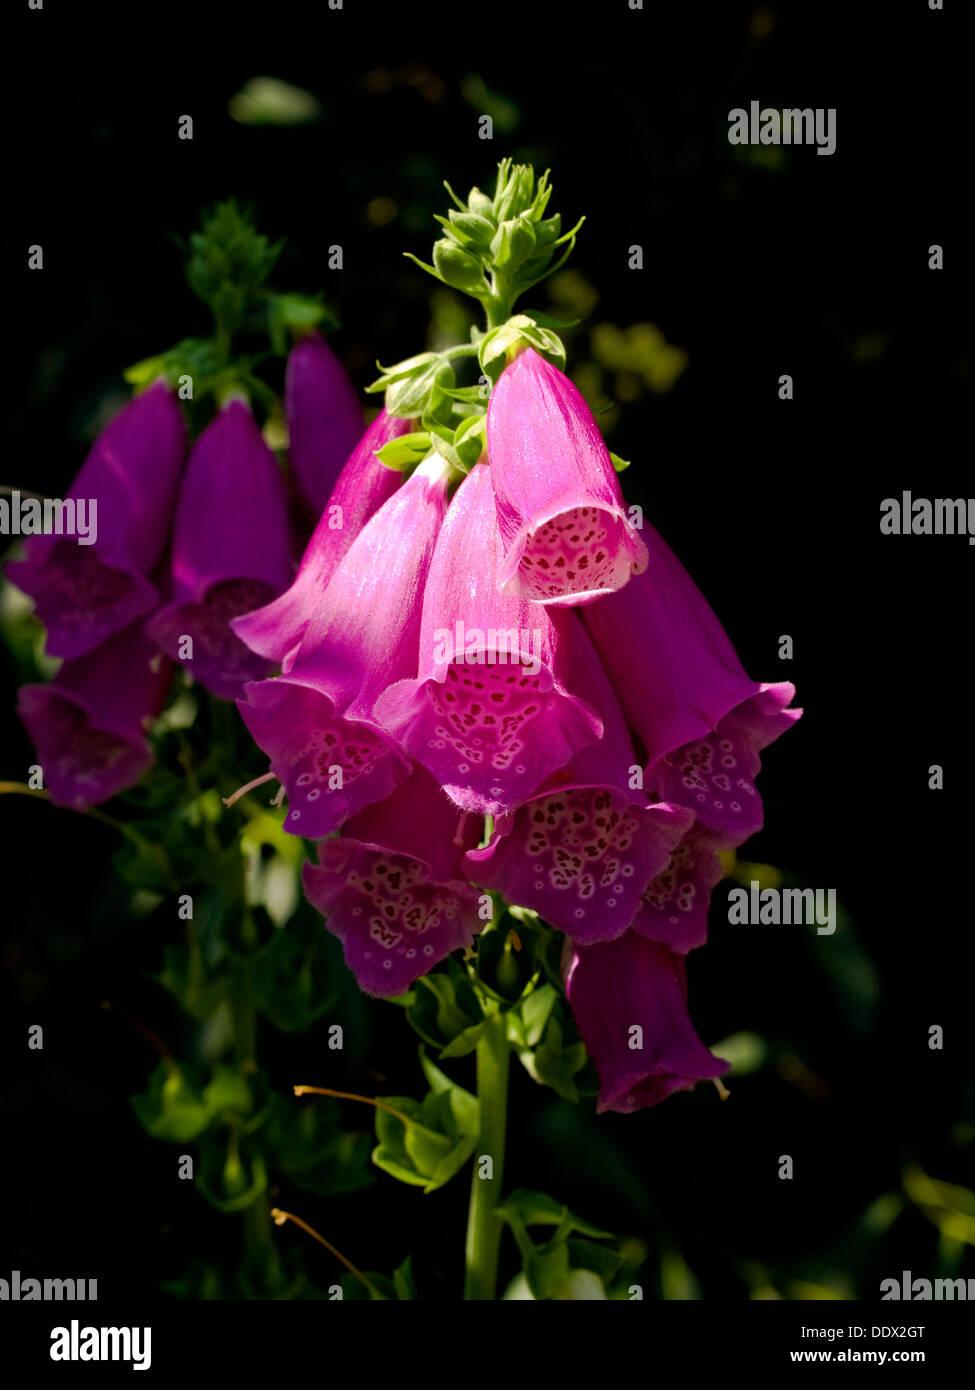 Foxglove (Digitalis purpurea) flowers - Stock Image